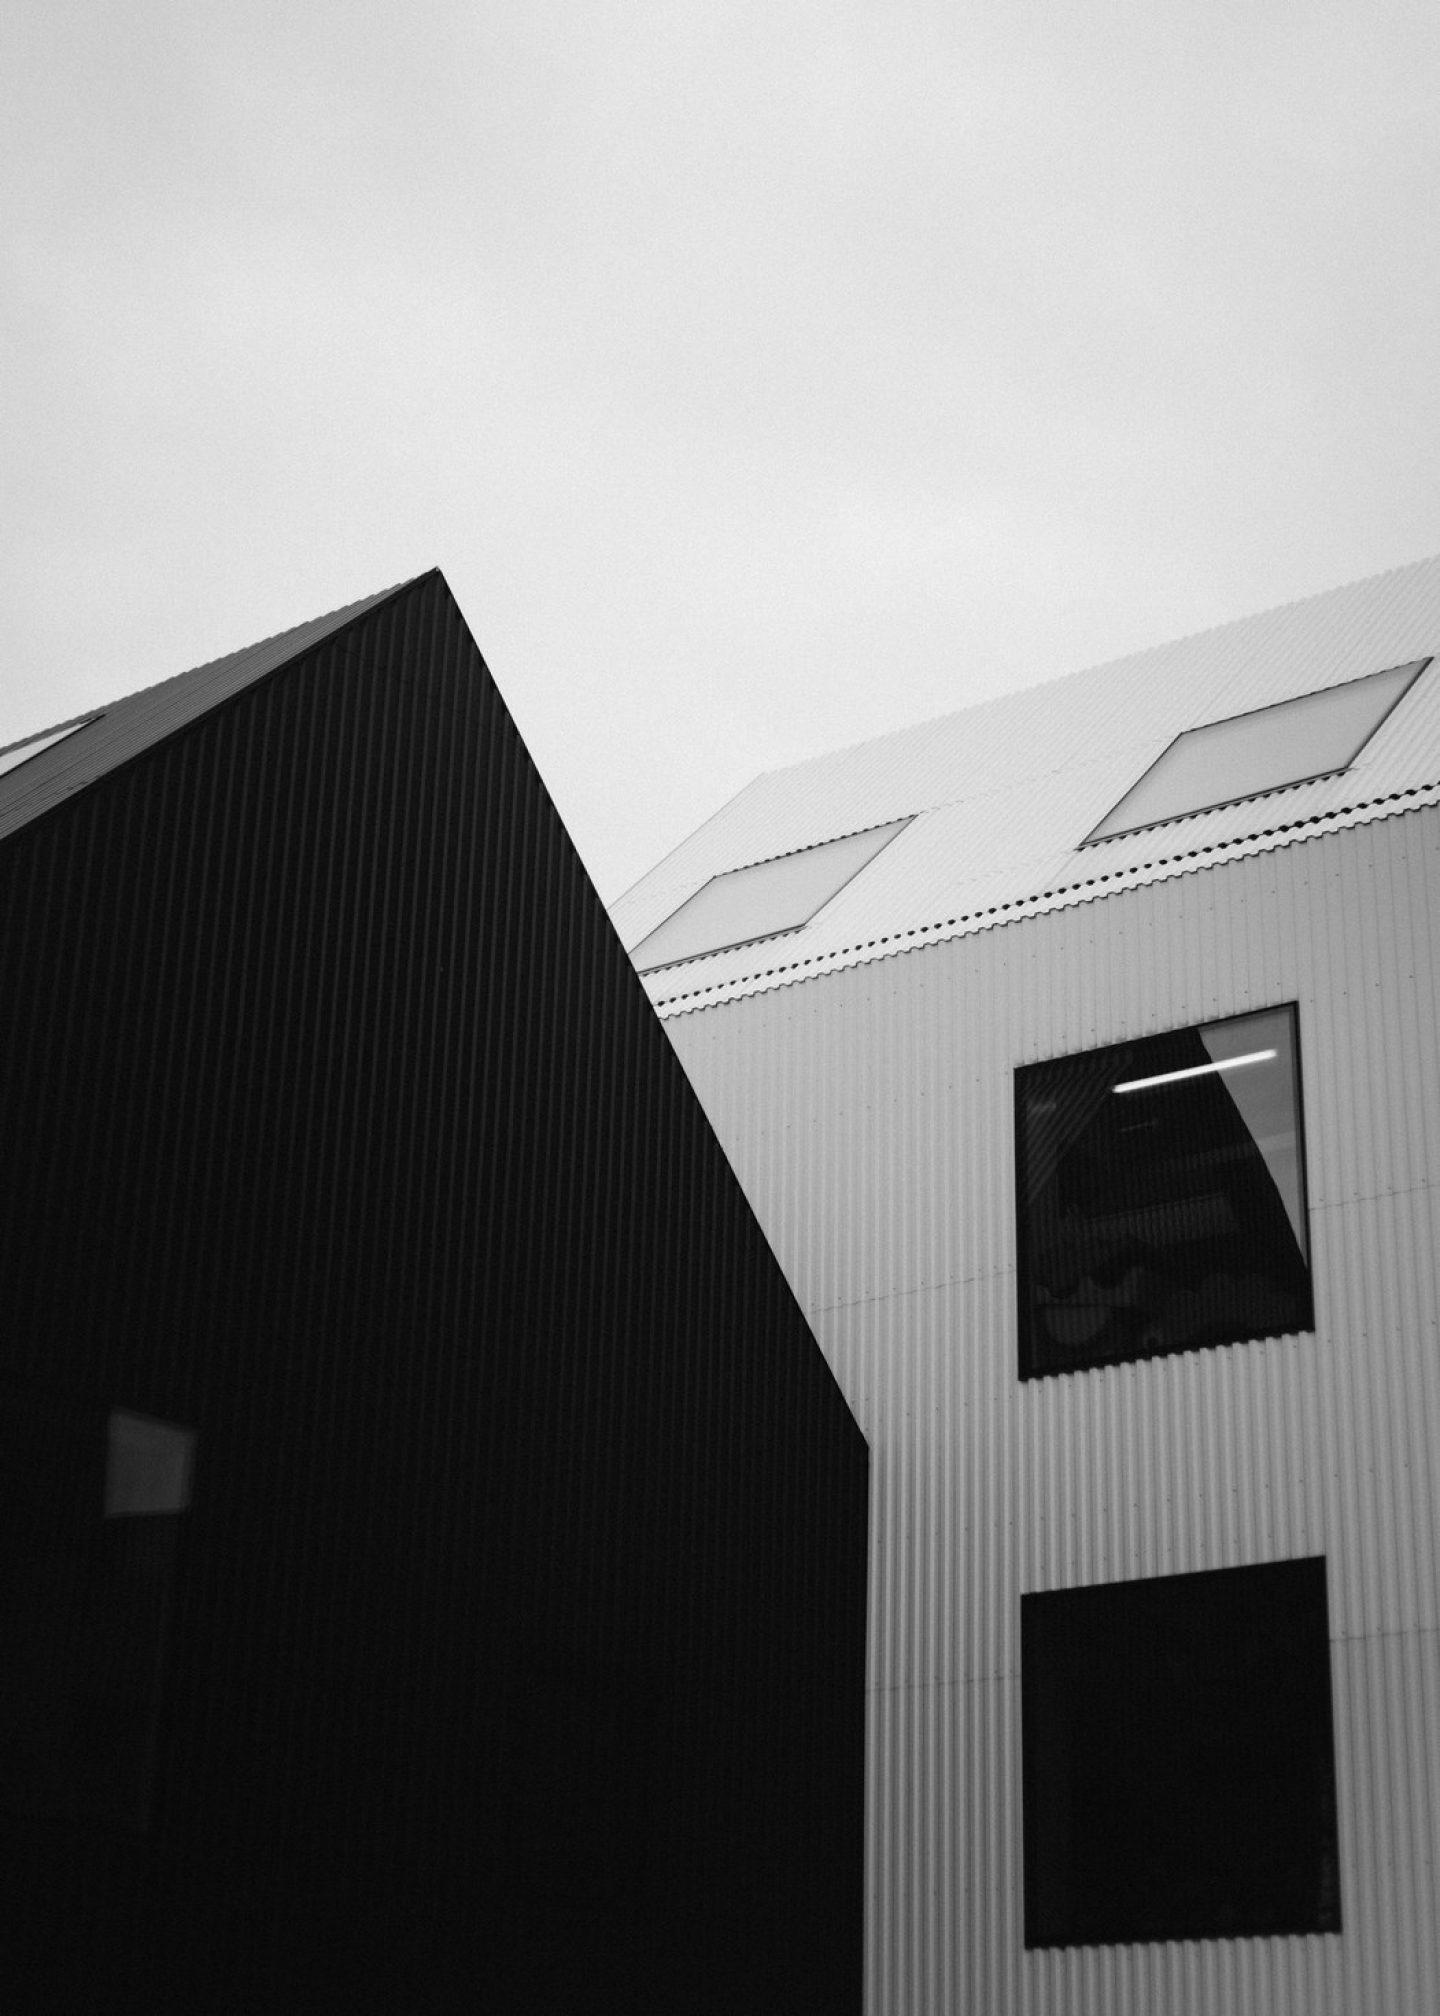 kim_holtermand_architecture-4-kopiowanie